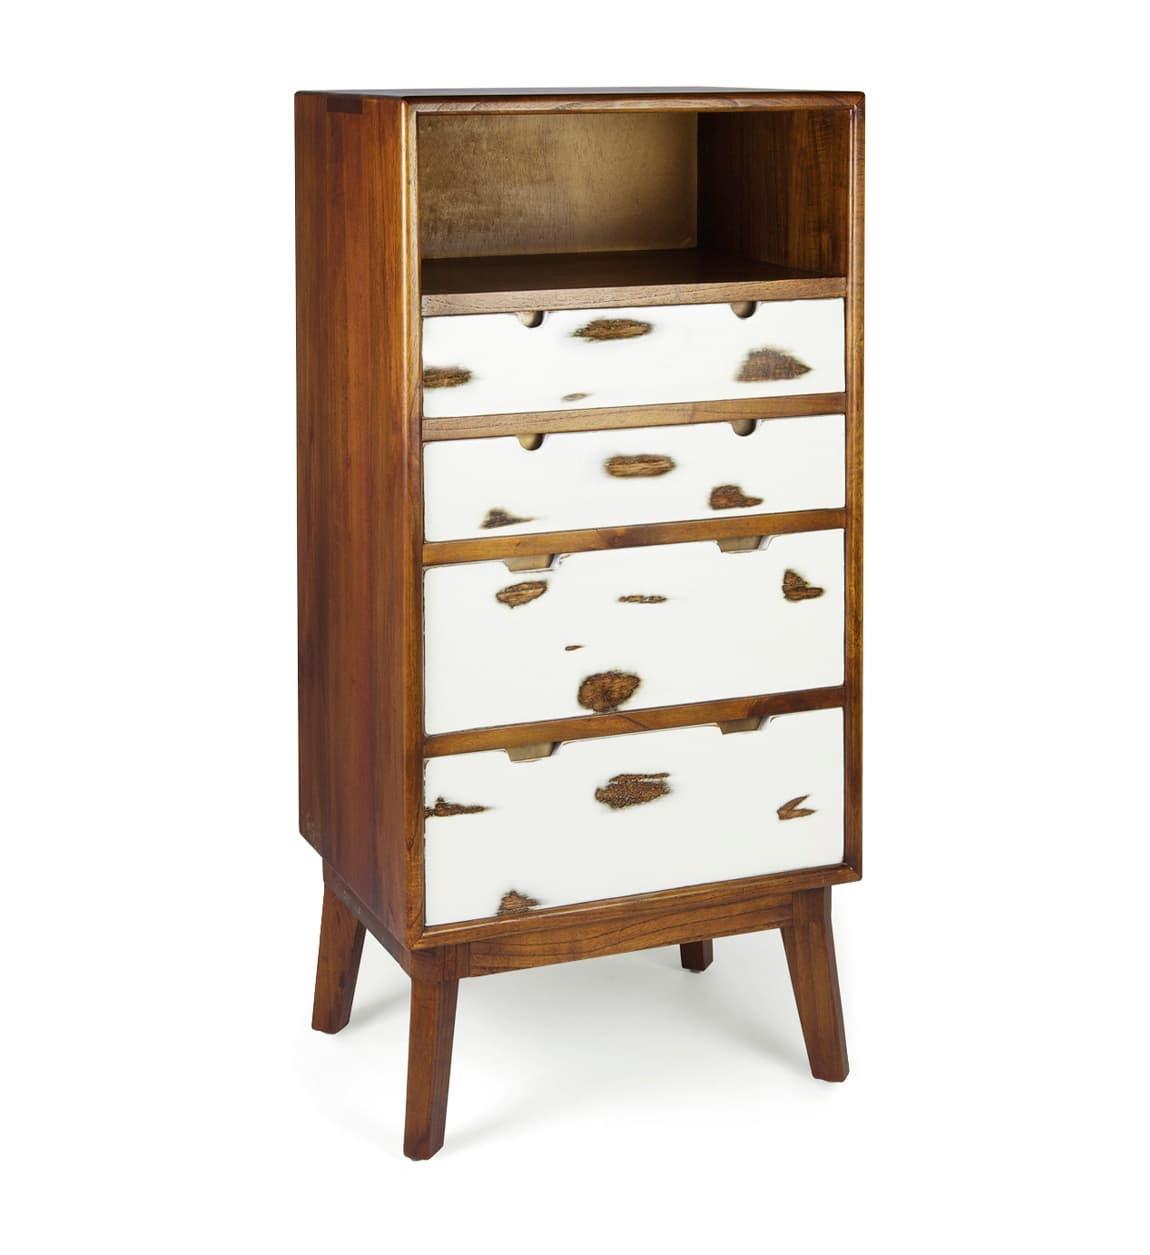 Cabinet din lemn cu 4 sertare, Nordic Nuc / Alb, l60xA45xH125 cm somproduct.ro